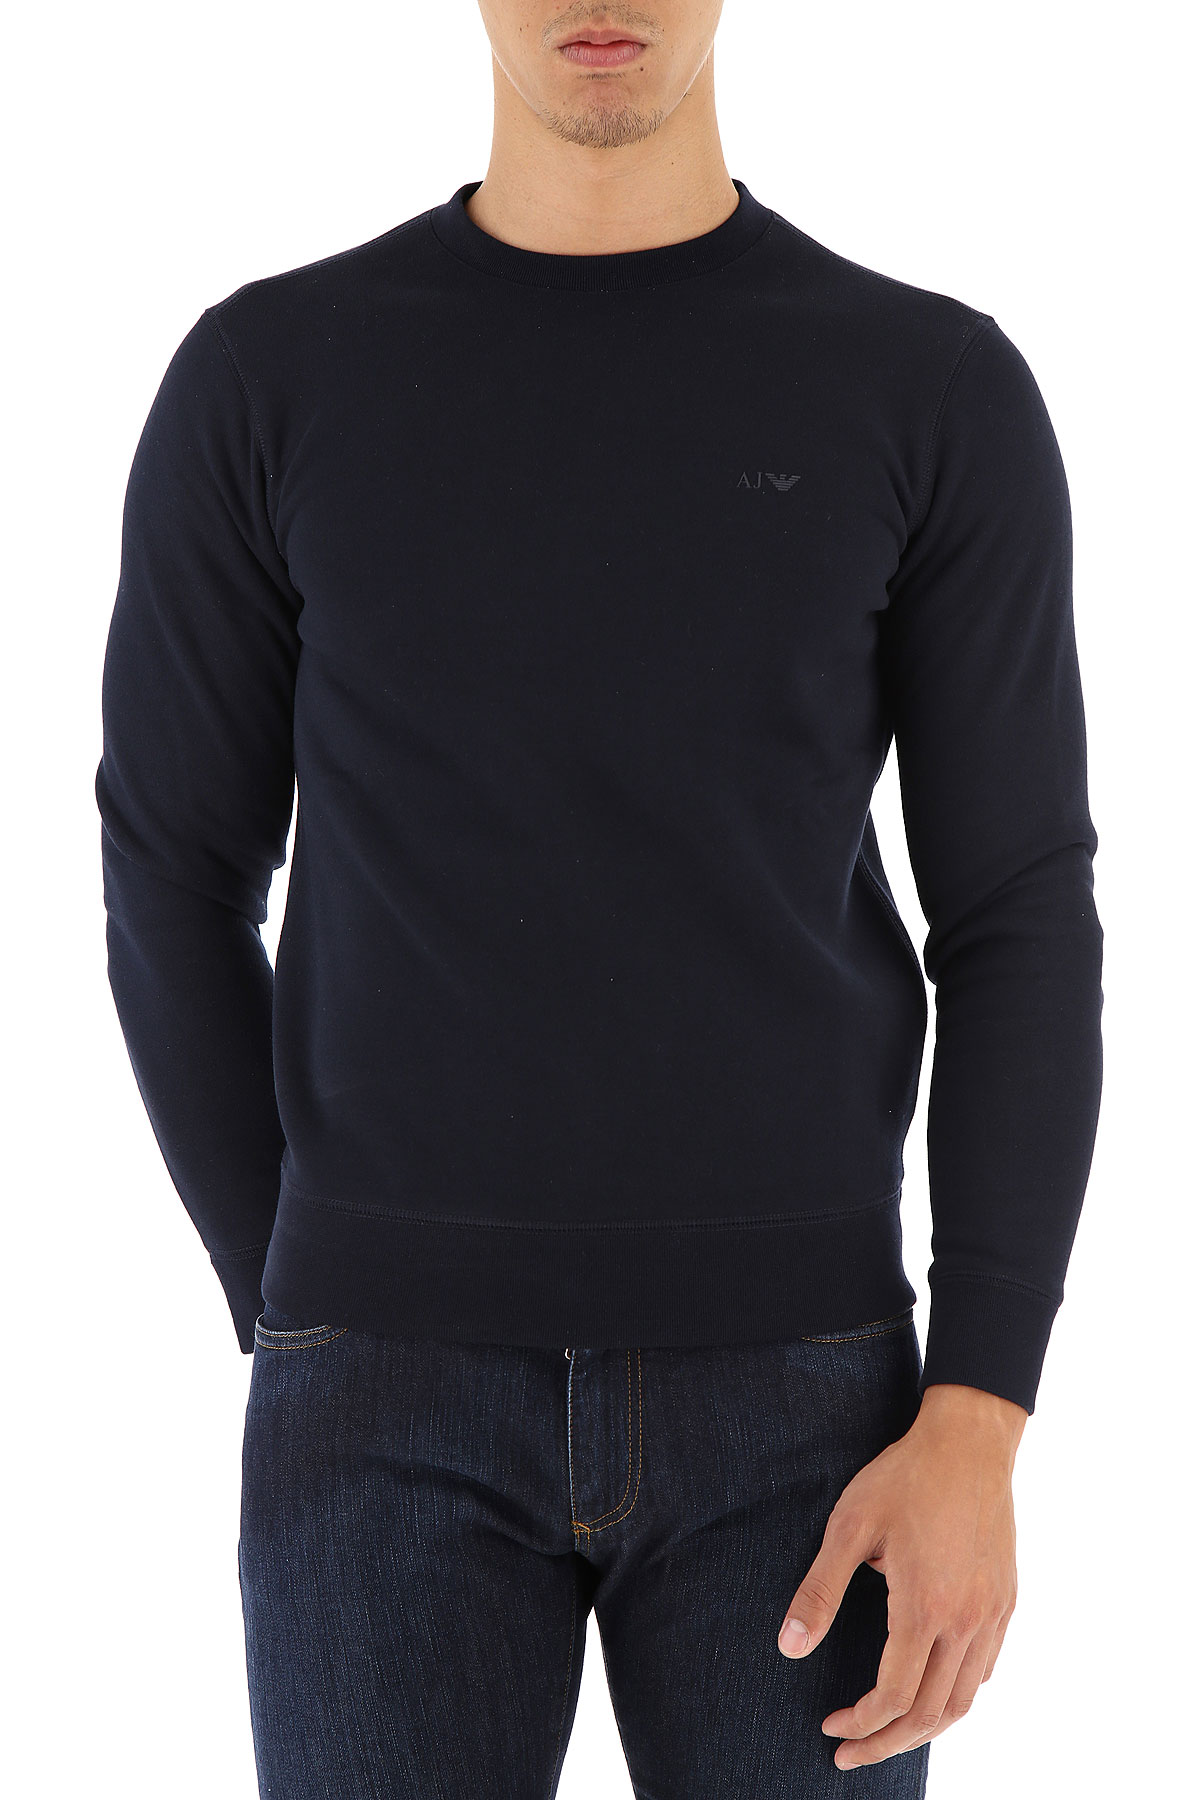 Emporio Armani Pull Homme, Bleu nuit, Coton, 2017, L M XL XXL